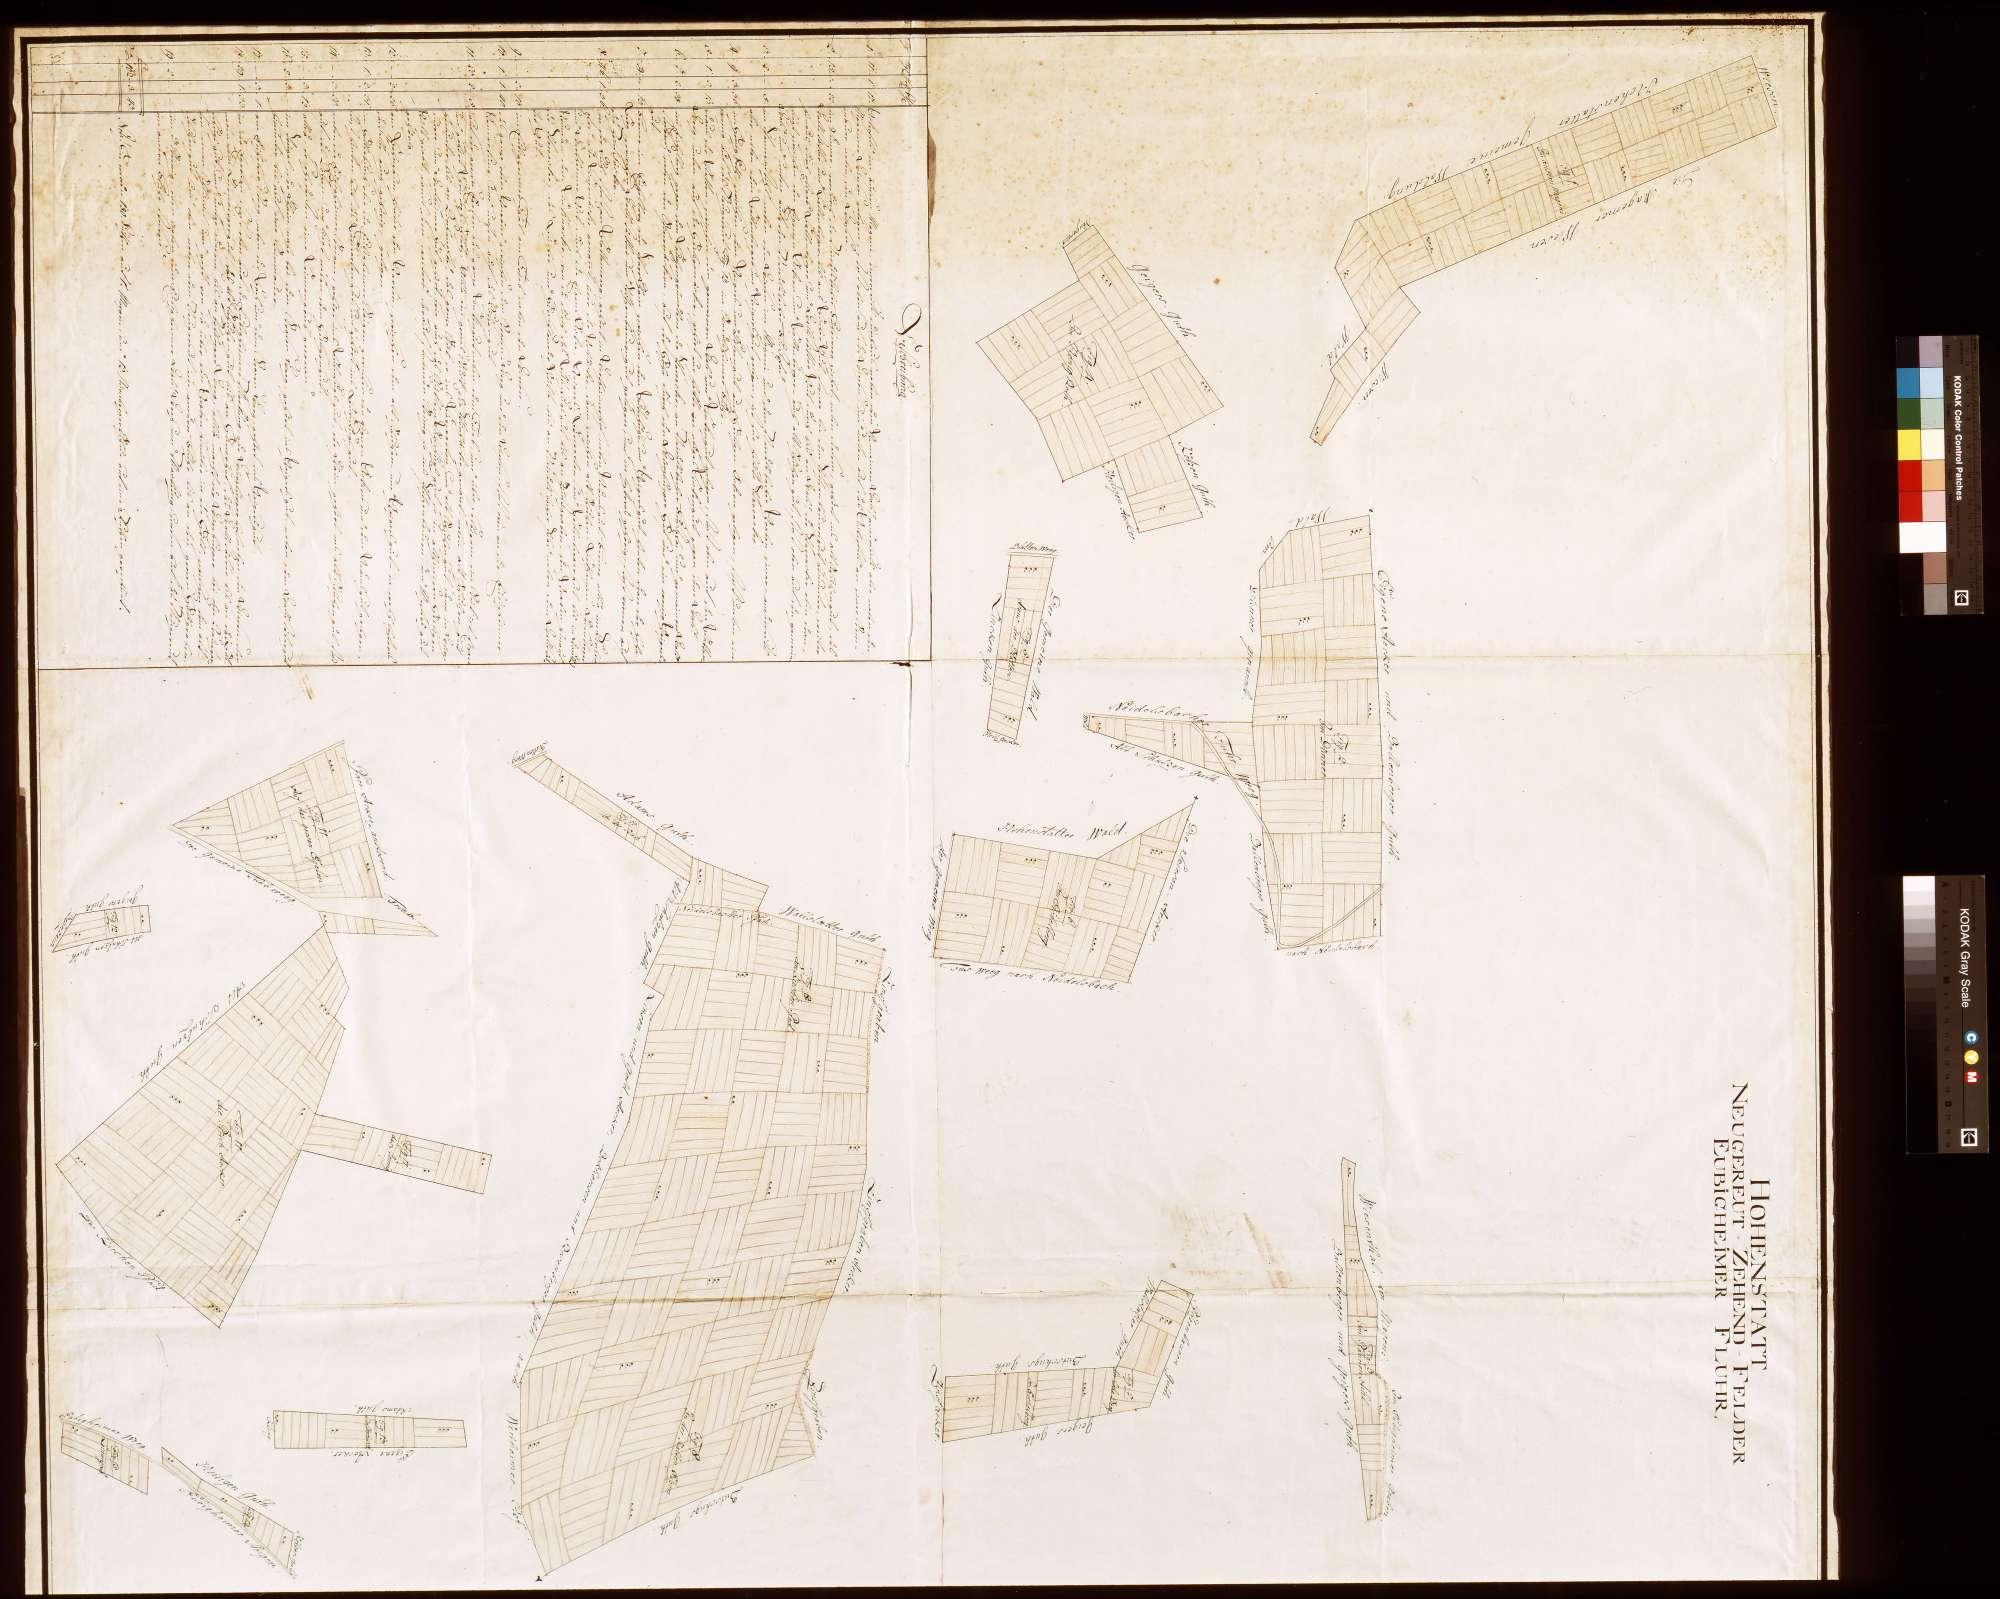 Hohenstadt: Neugereutzehntfelder, Eubigheimer Flur (Inselkarte), Bild 1